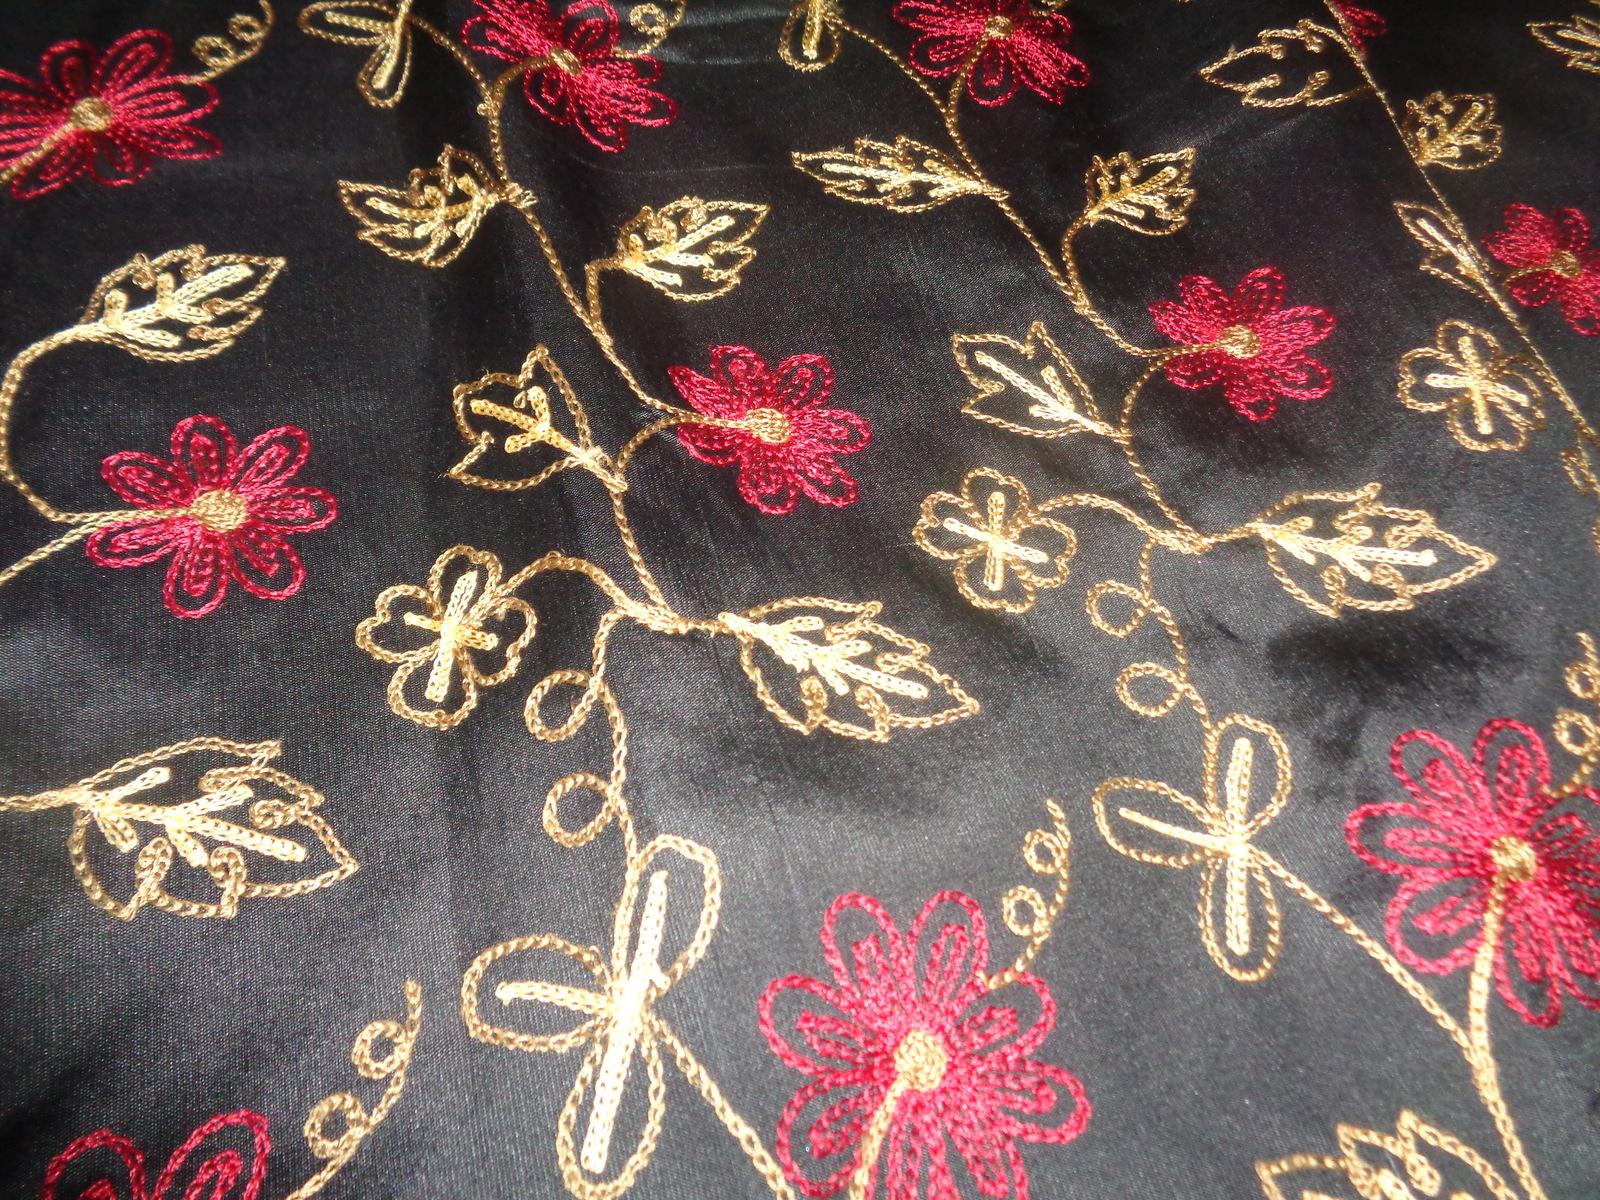 Silkland 100% Silk Floral Fringe Skirt Women's SZ 10 NEW Condition